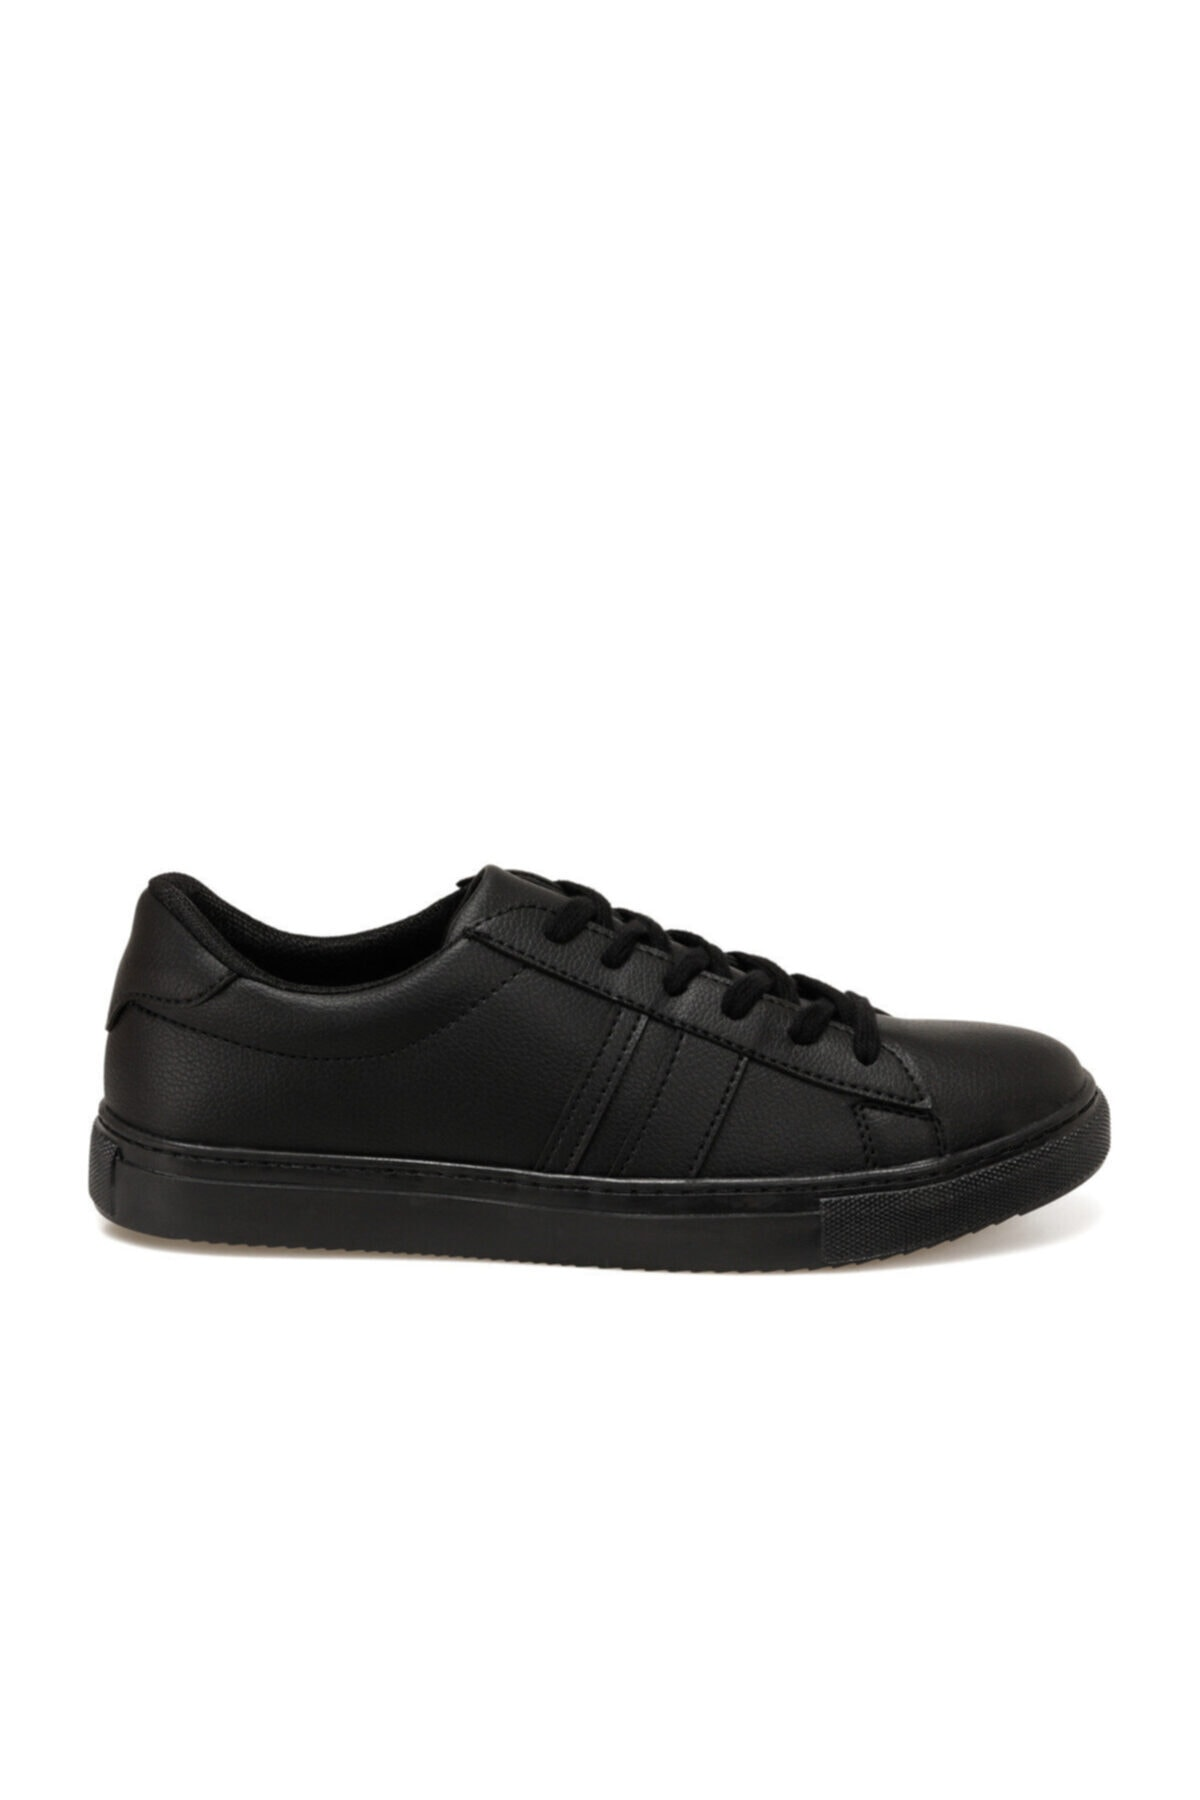 PANAMA CLUB Erkek Siyah  Ayakkabı Yde92-155 2